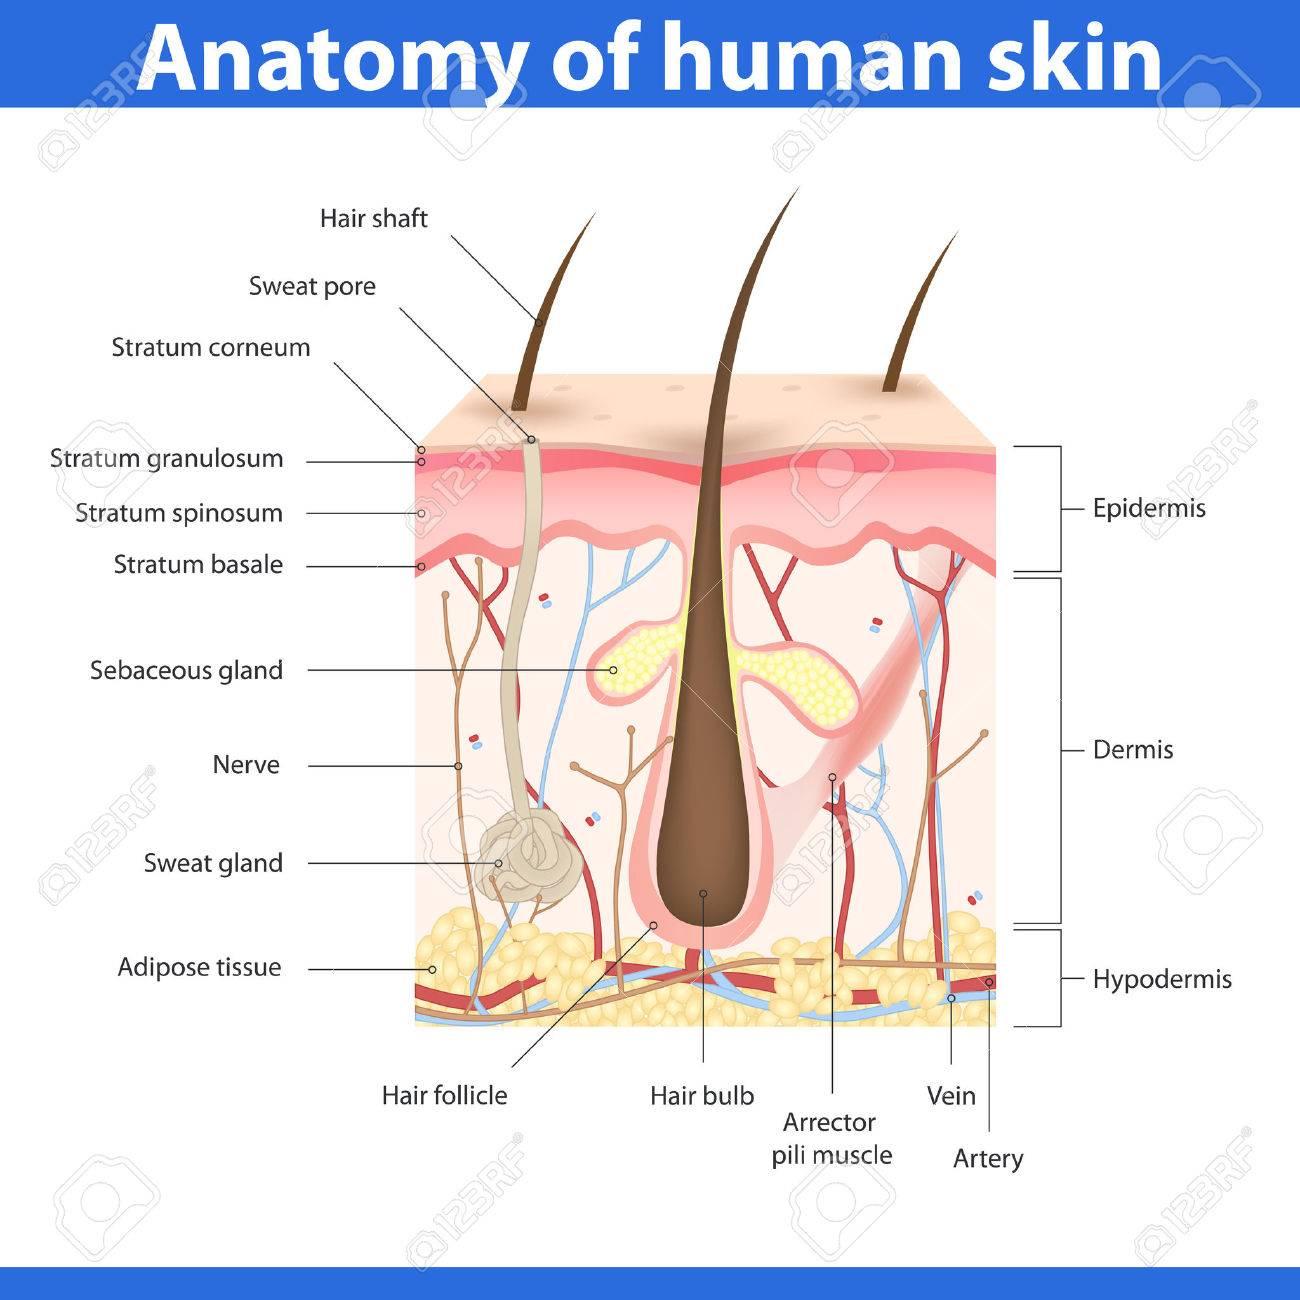 Structure of human skin, detailed description illustration - 56934739